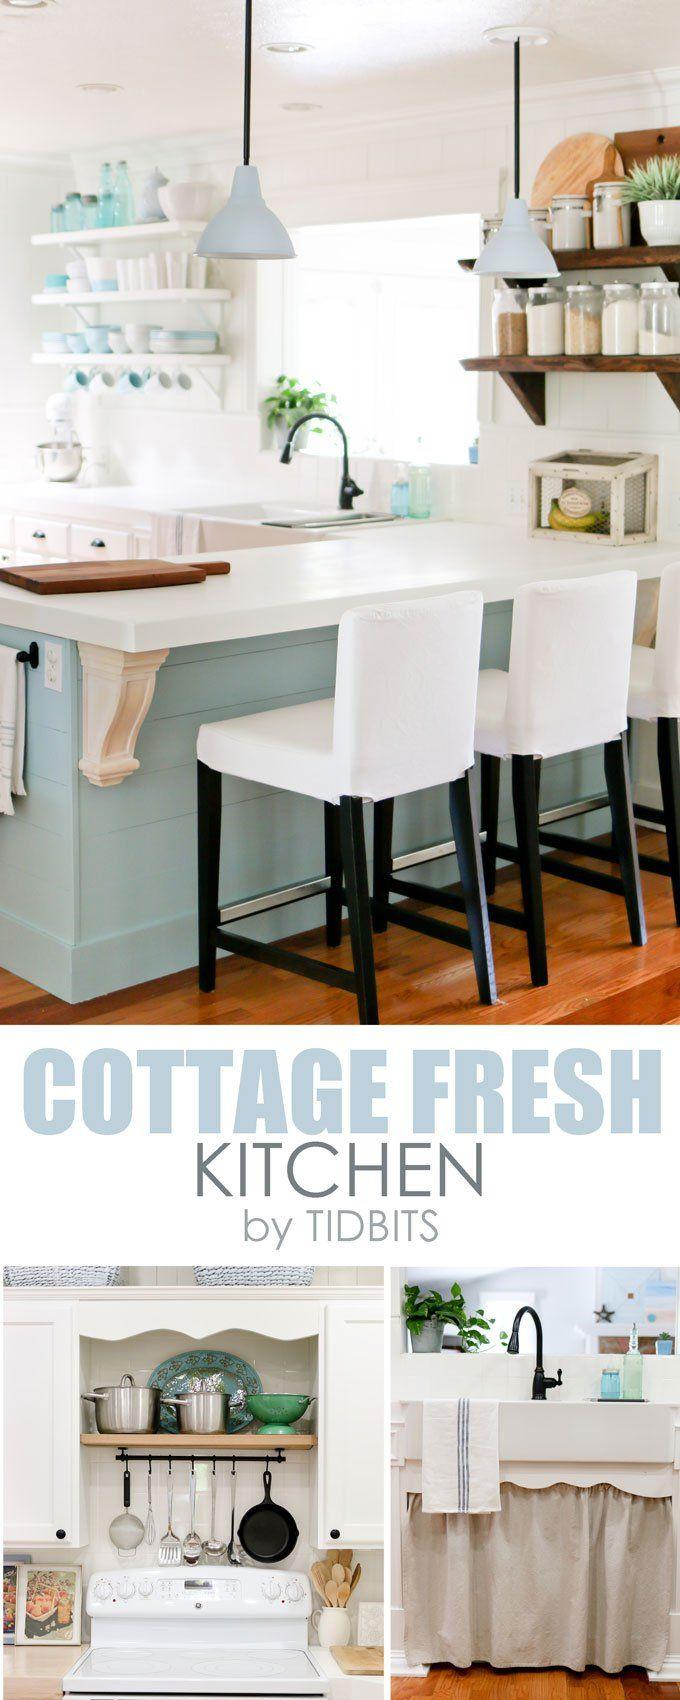 Cottage Fresh Kitchen // Love The Color Pallet & Open Shelving